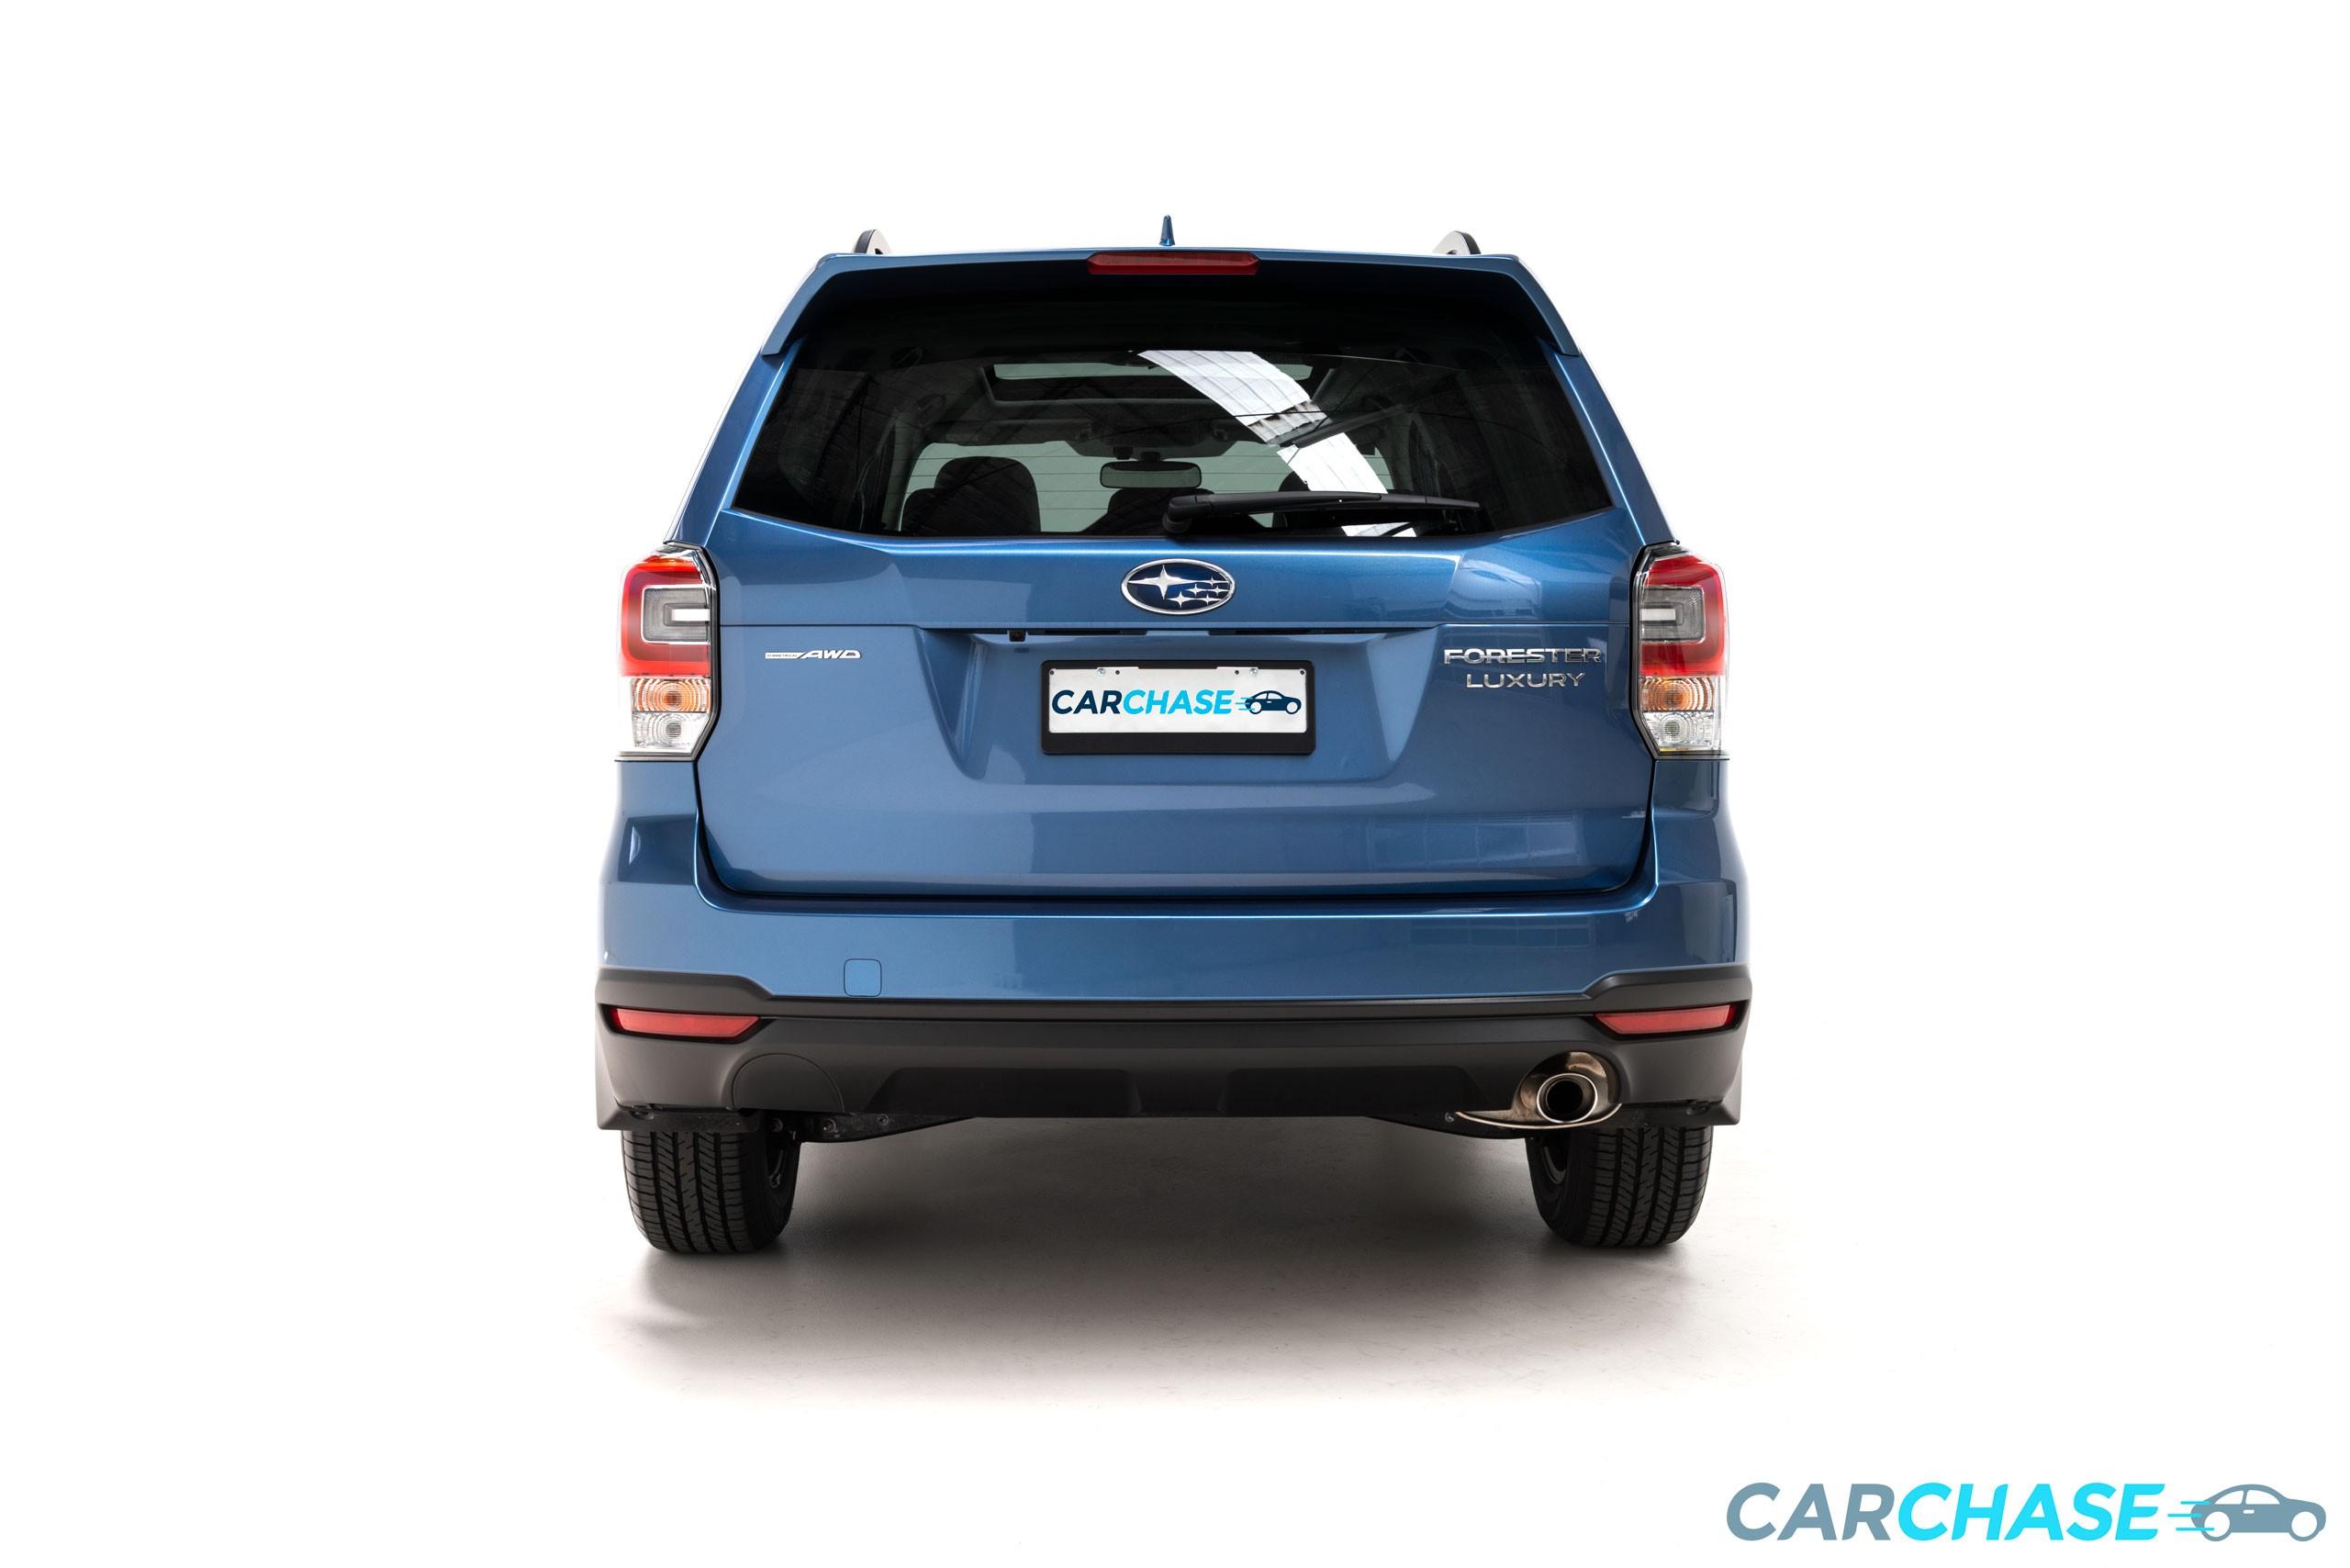 Image of back profile of 2018 Subaru Forester 2.5i-L Luxury